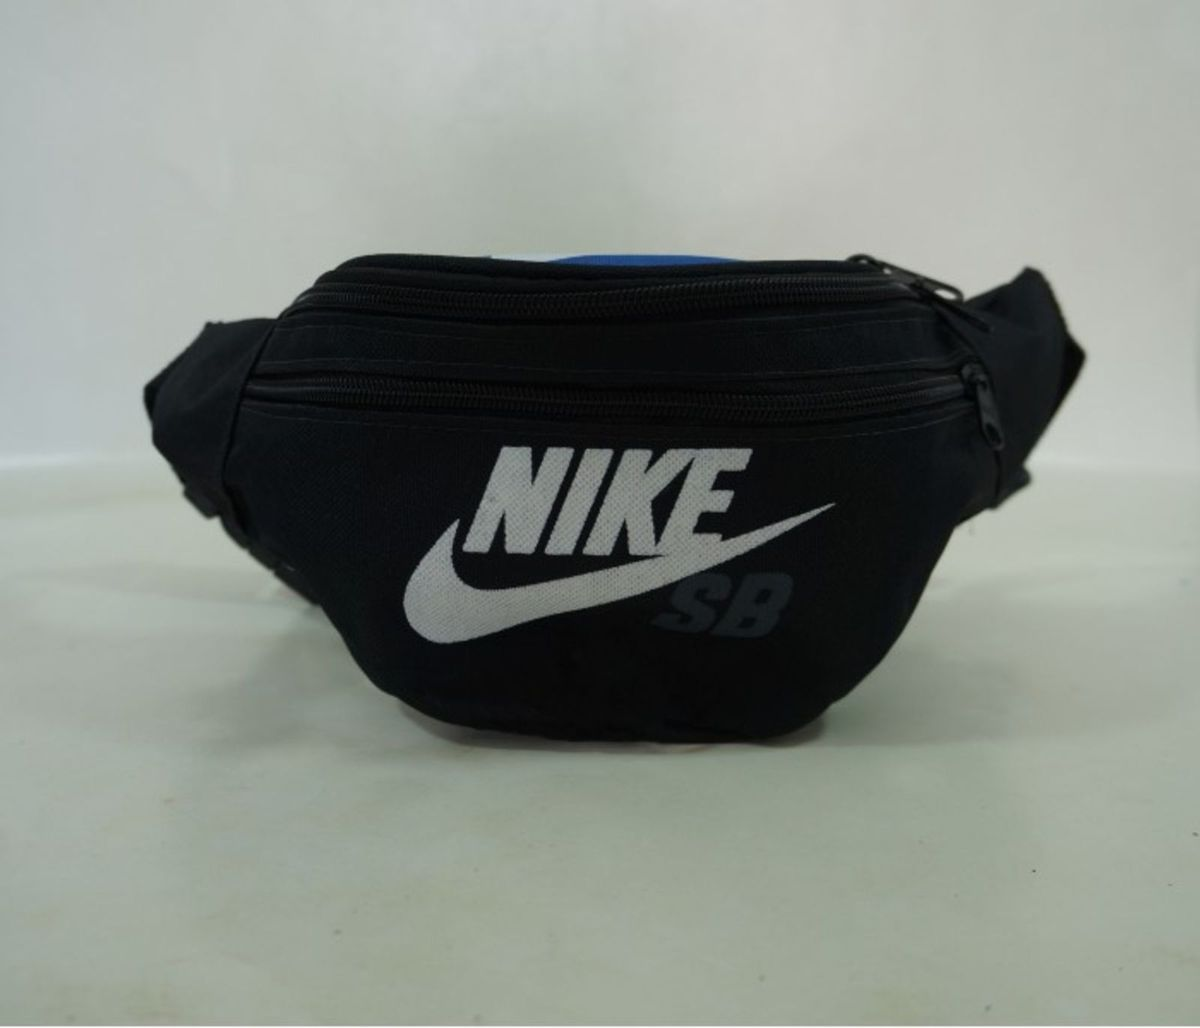 7295d30b1 pochete nike azul e preto - bolsas nike.  Czm6ly9wag90b3muzw5qb2vplmnvbs5ici9wcm9kdwn0cy82nzc4mjexl2qymju4yjg4mdg3ymq5otniowi2ytvmymrhzdi3mtbilmpwzw